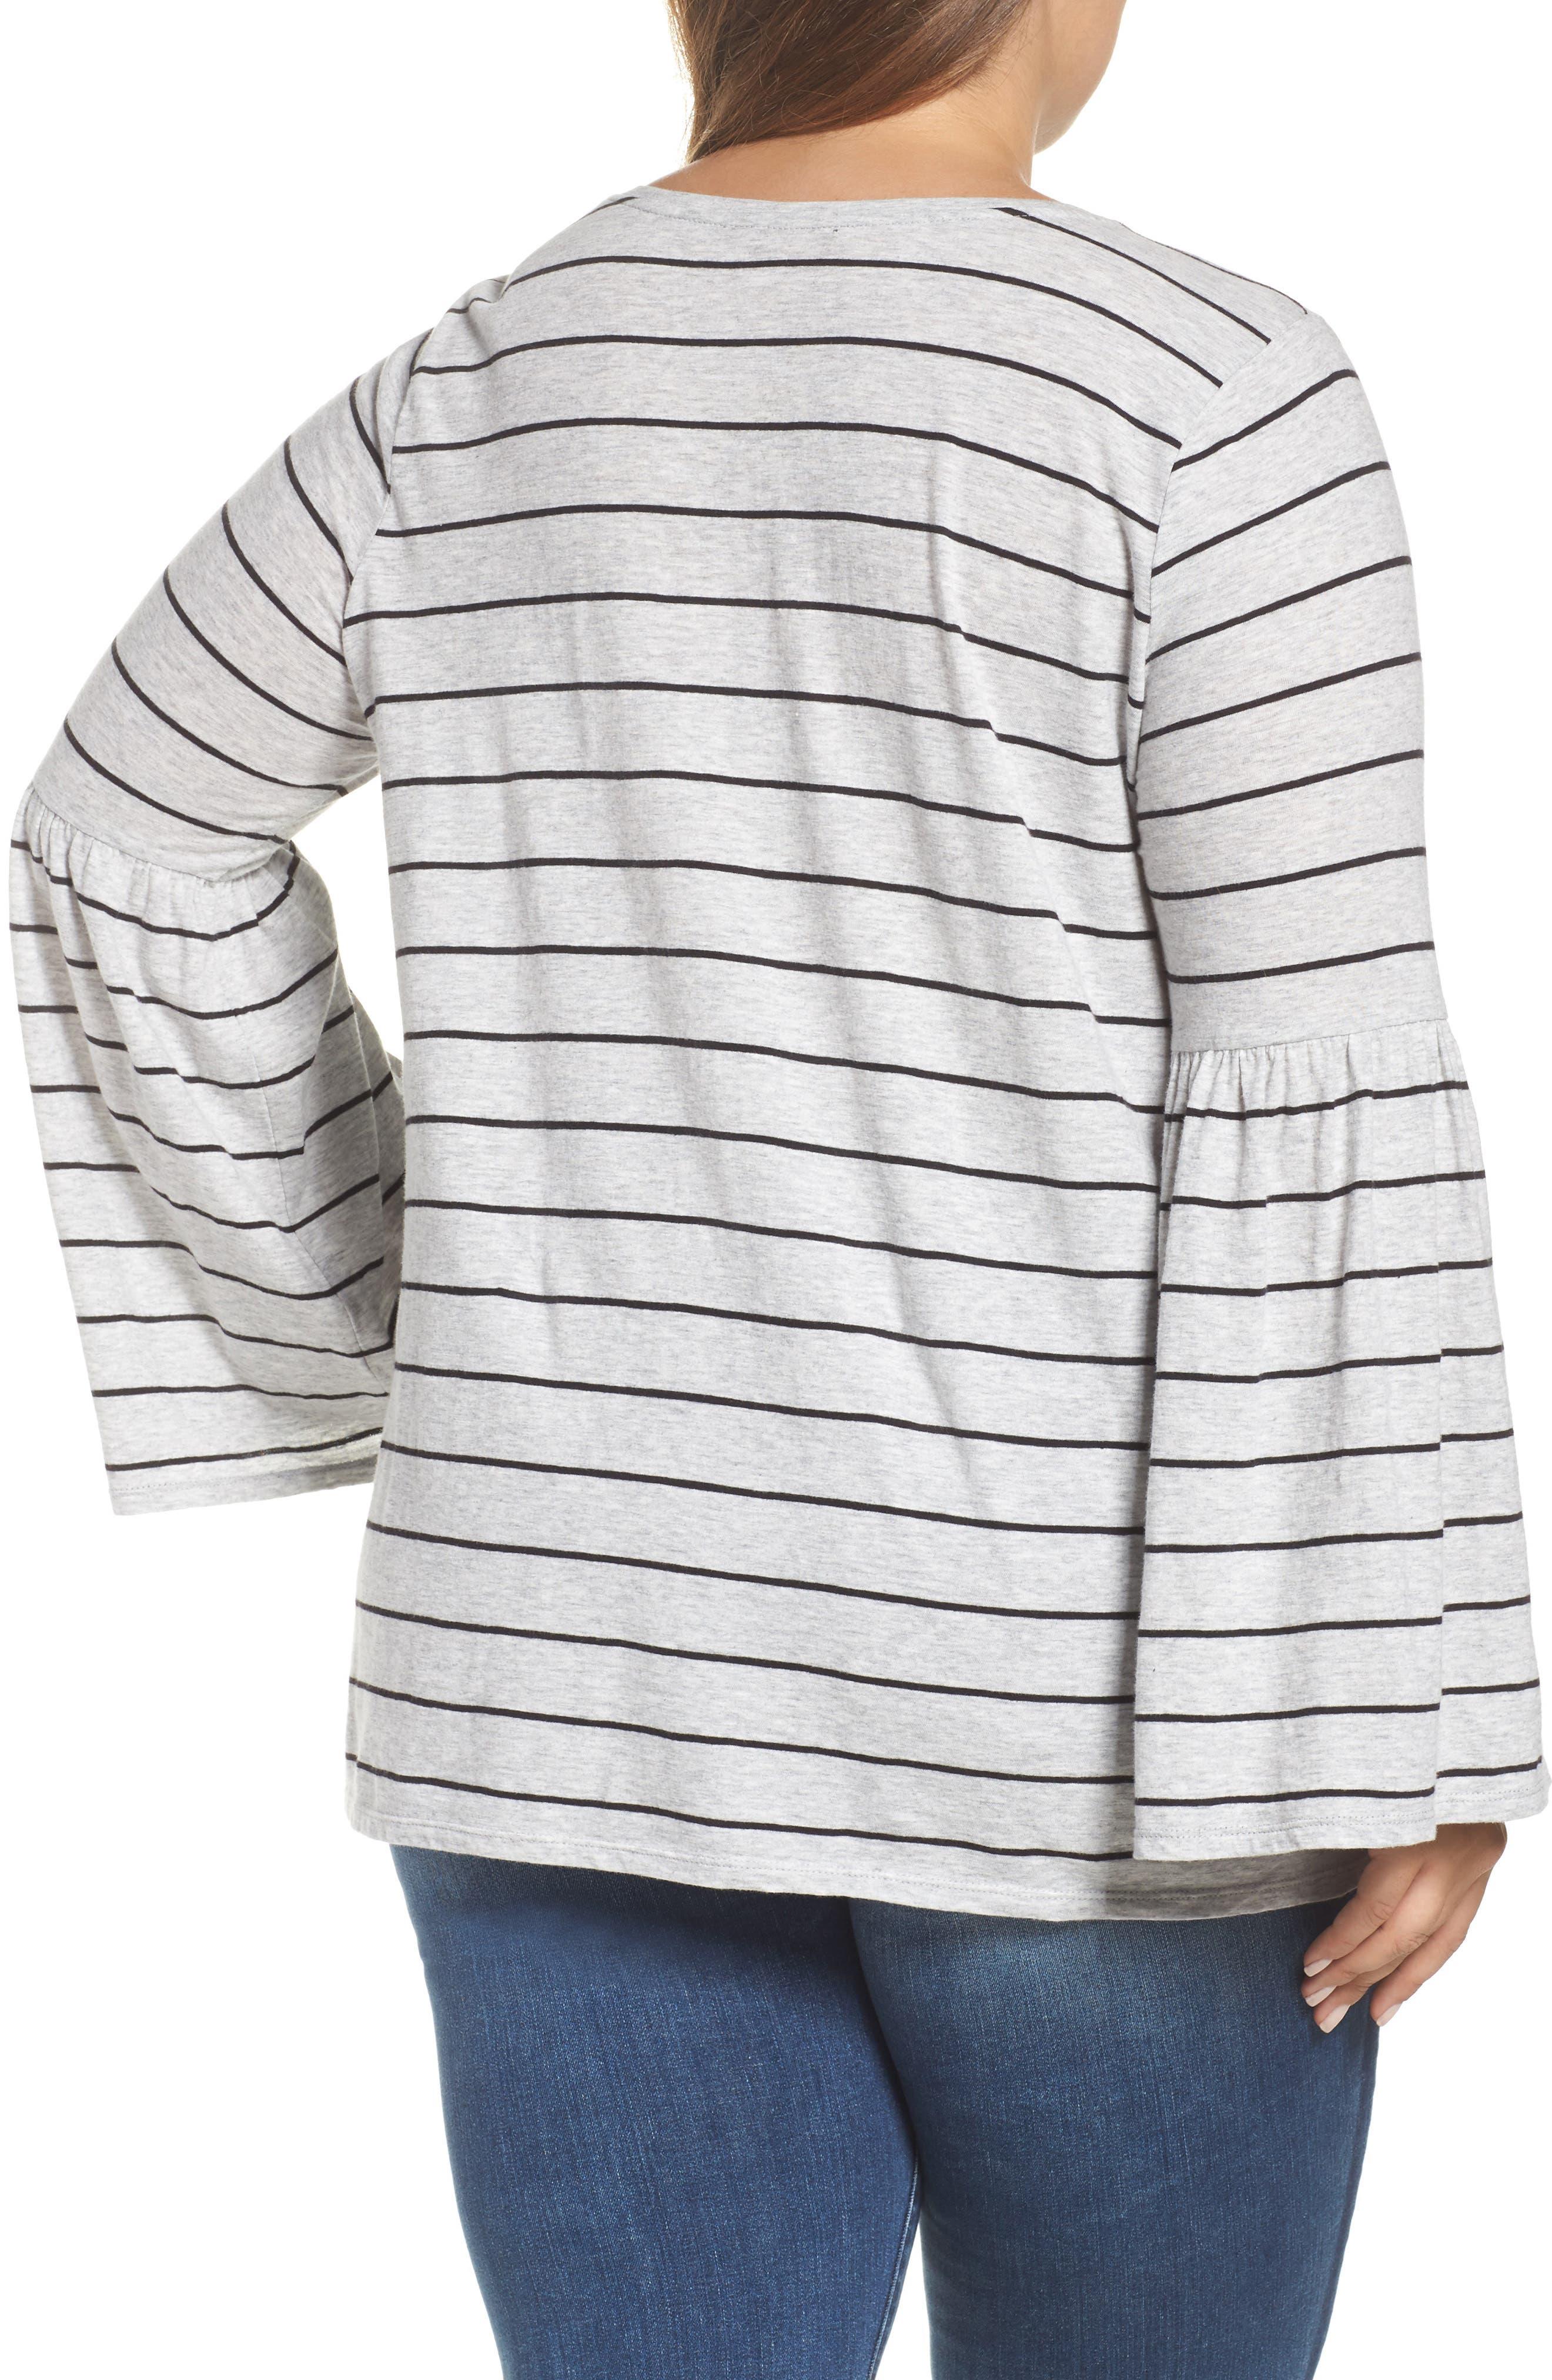 Nova Stripe Bell Sleeve Top,                             Alternate thumbnail 2, color,                             050